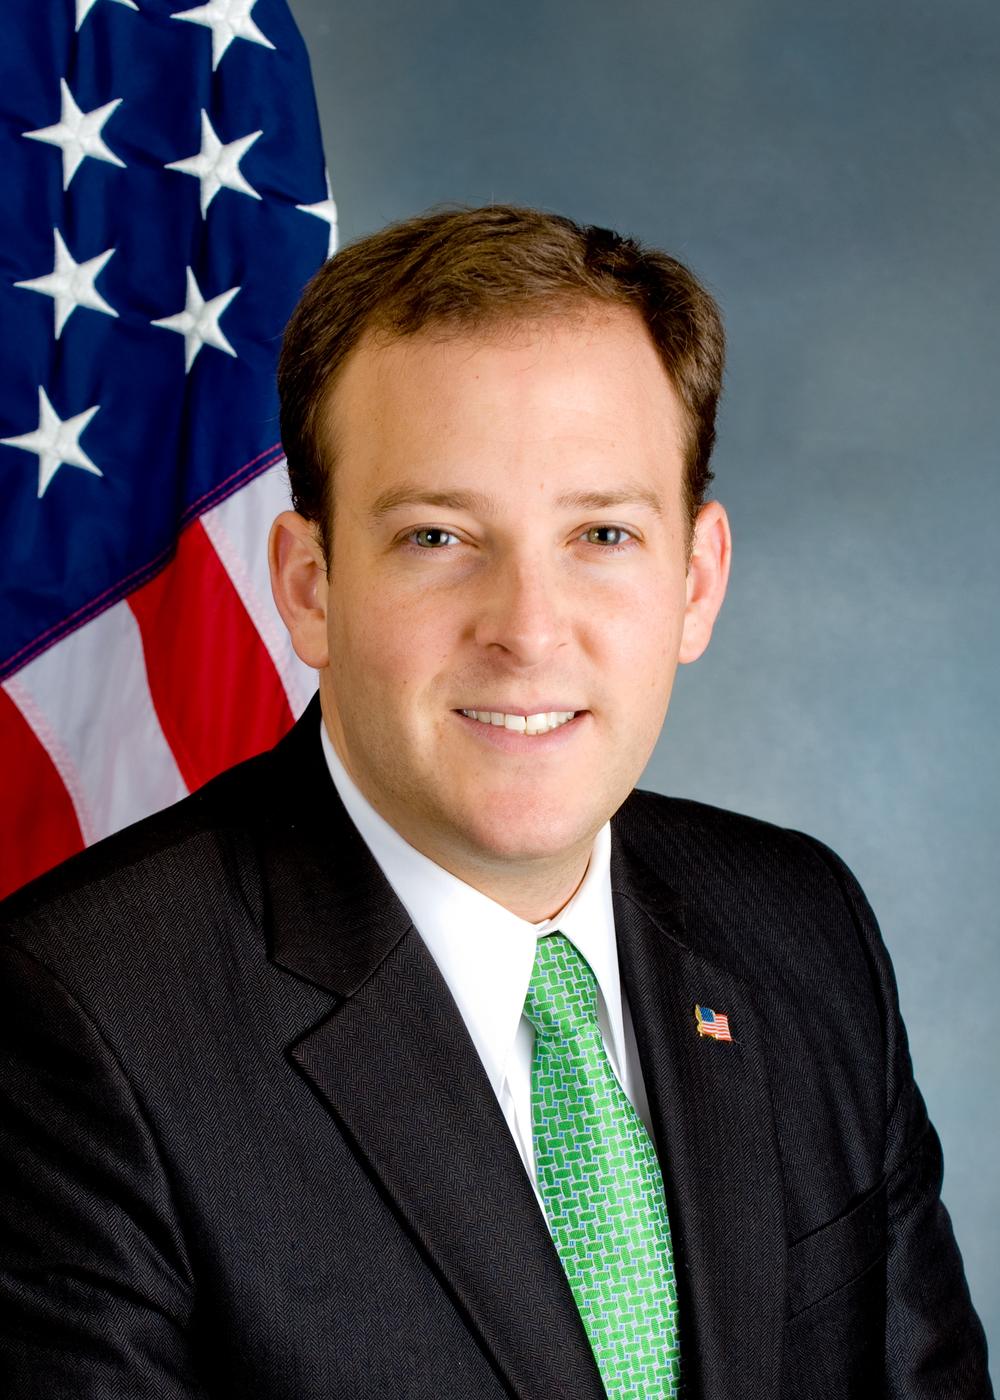 U.S. Rep. Lee Zeldin (R-NY). Credit: Wikimedia Commons.